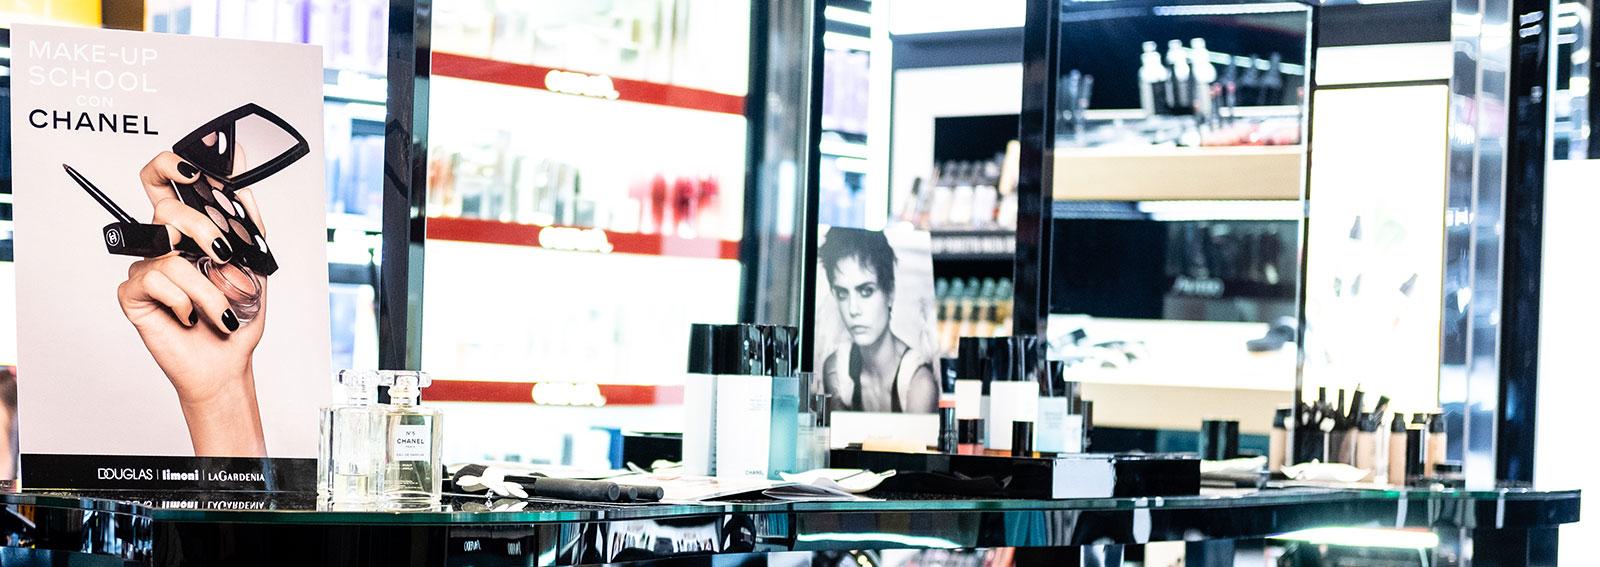 douglas-make-up-school-chanel---desktop